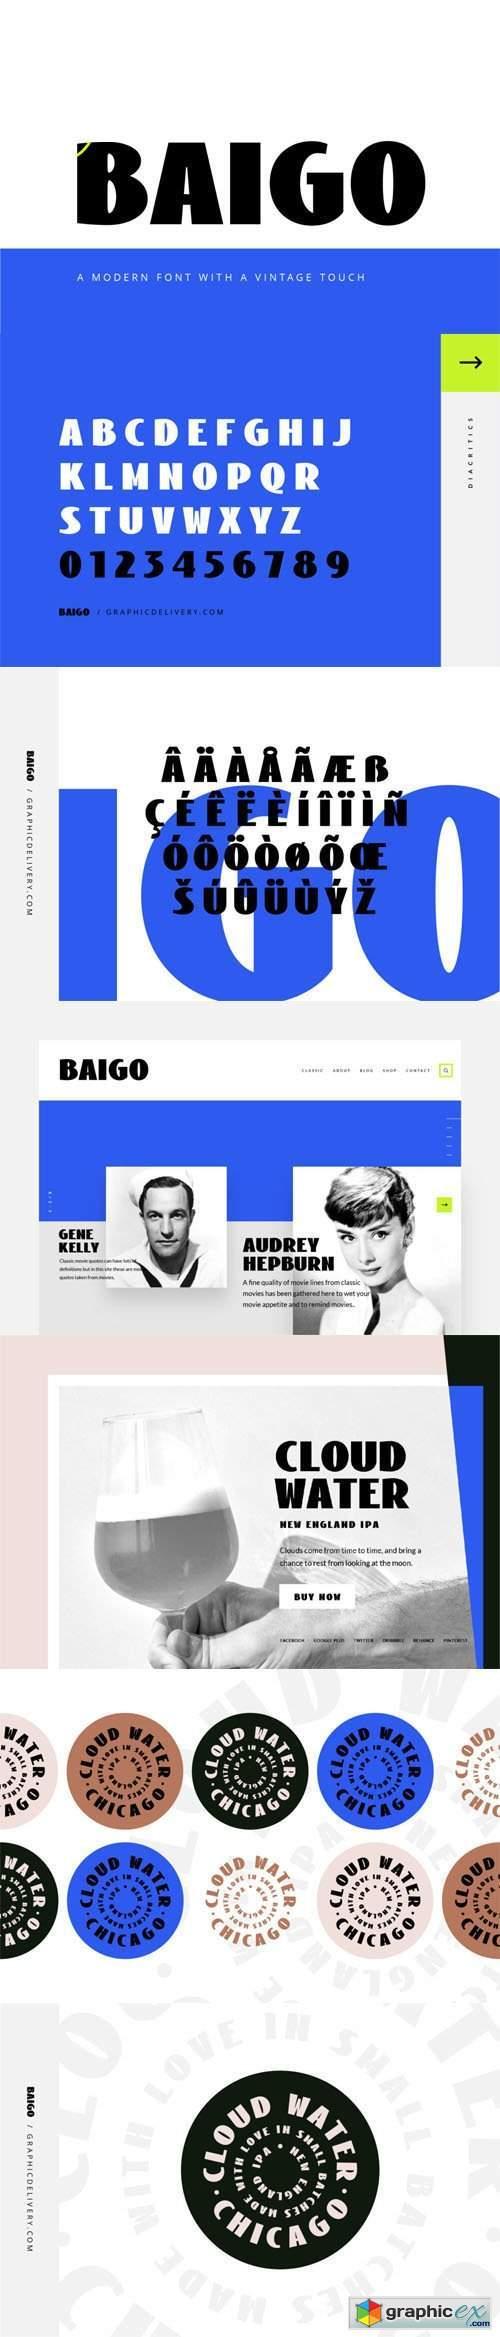 Baigo - A Modern Font with a Vintage Touch